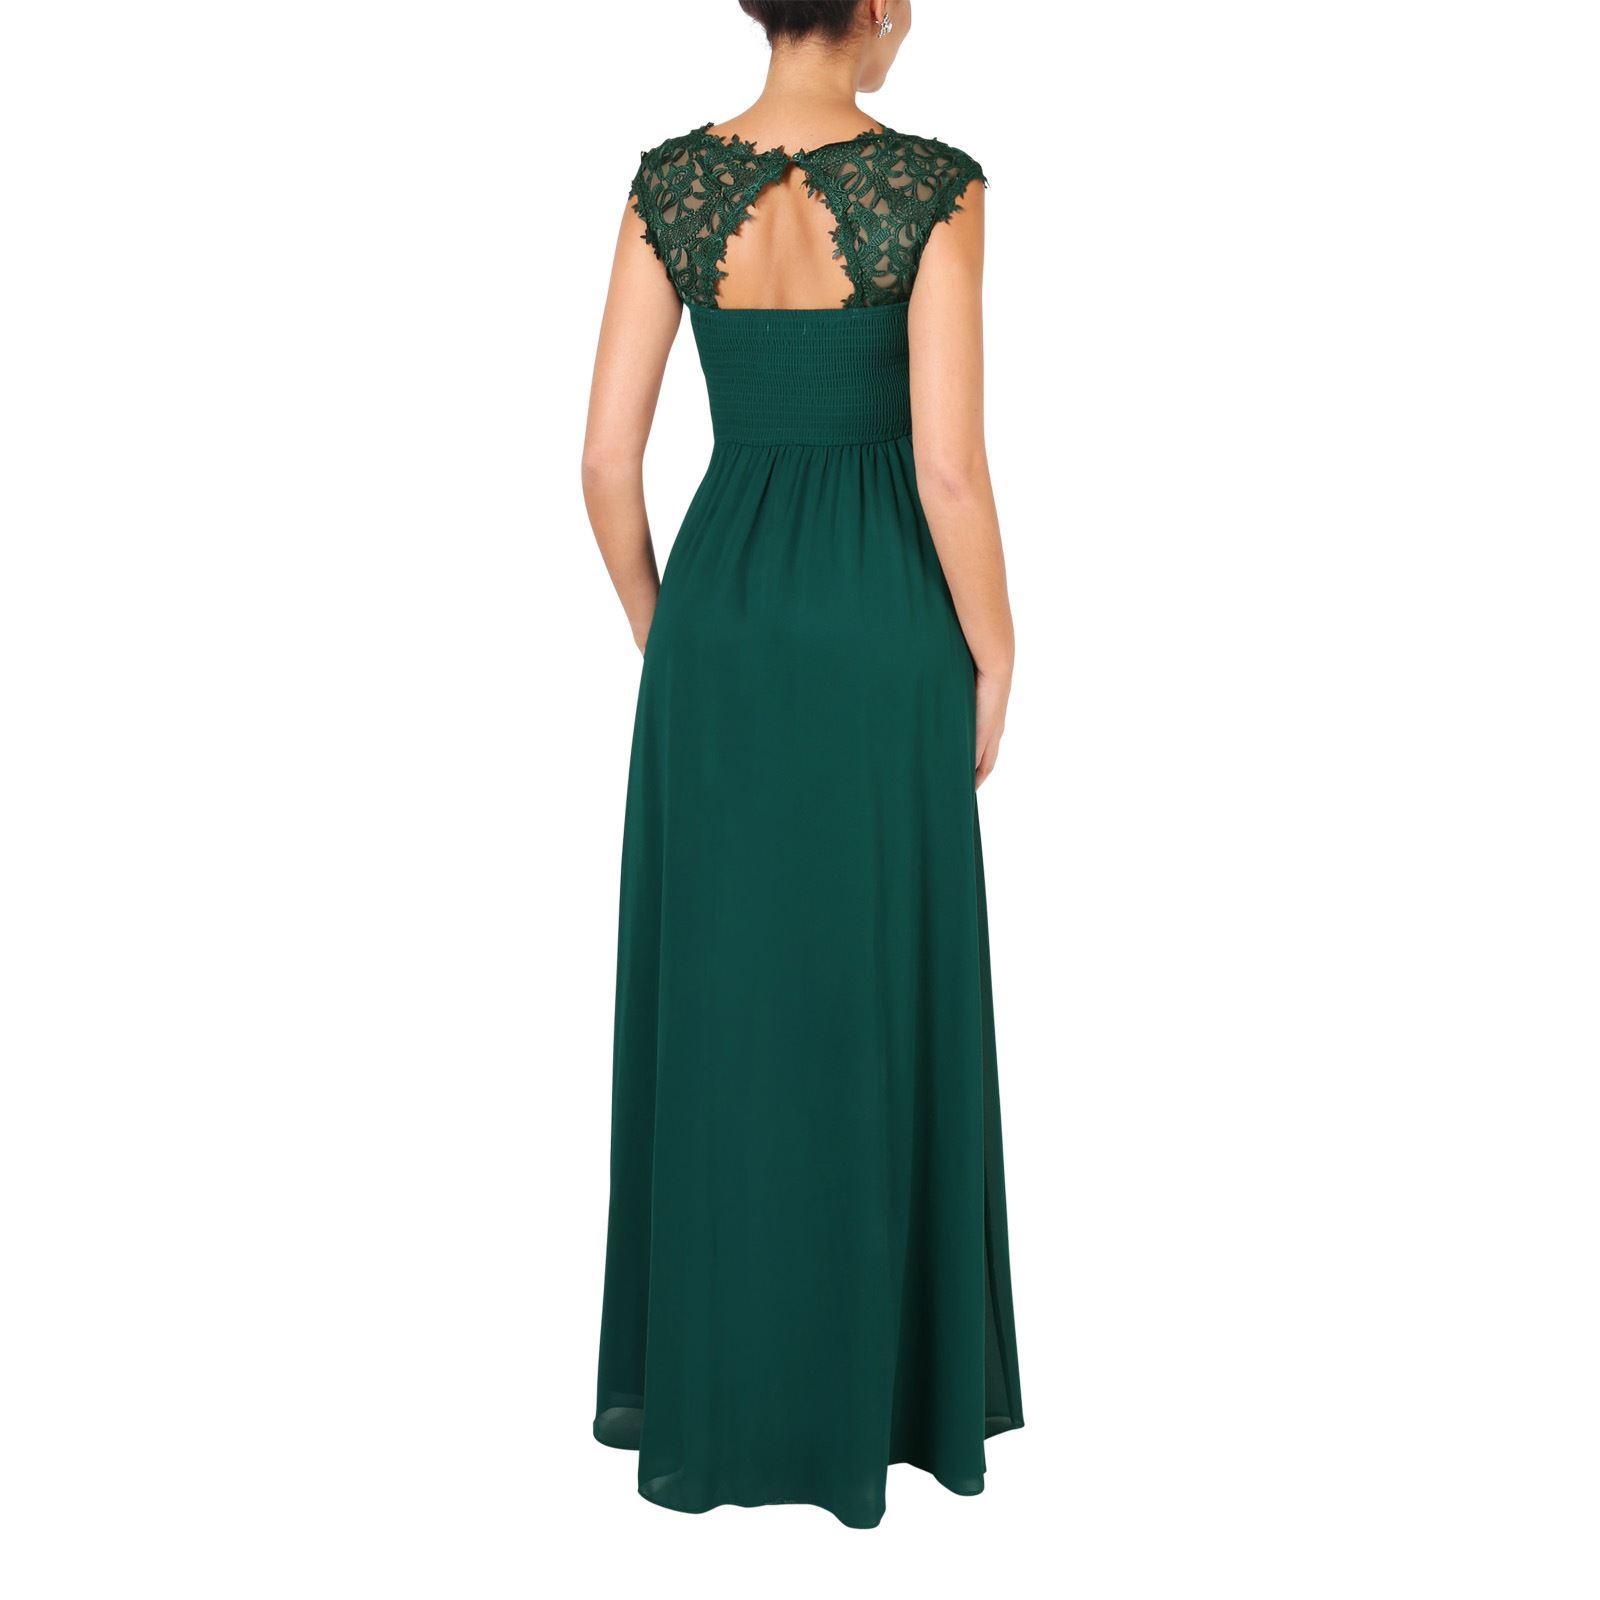 Womens-Wedding-Bridesmaid-Prom-Dress-Formal-One-Off-Shoulder-Long-Evening-8-18 thumbnail 17